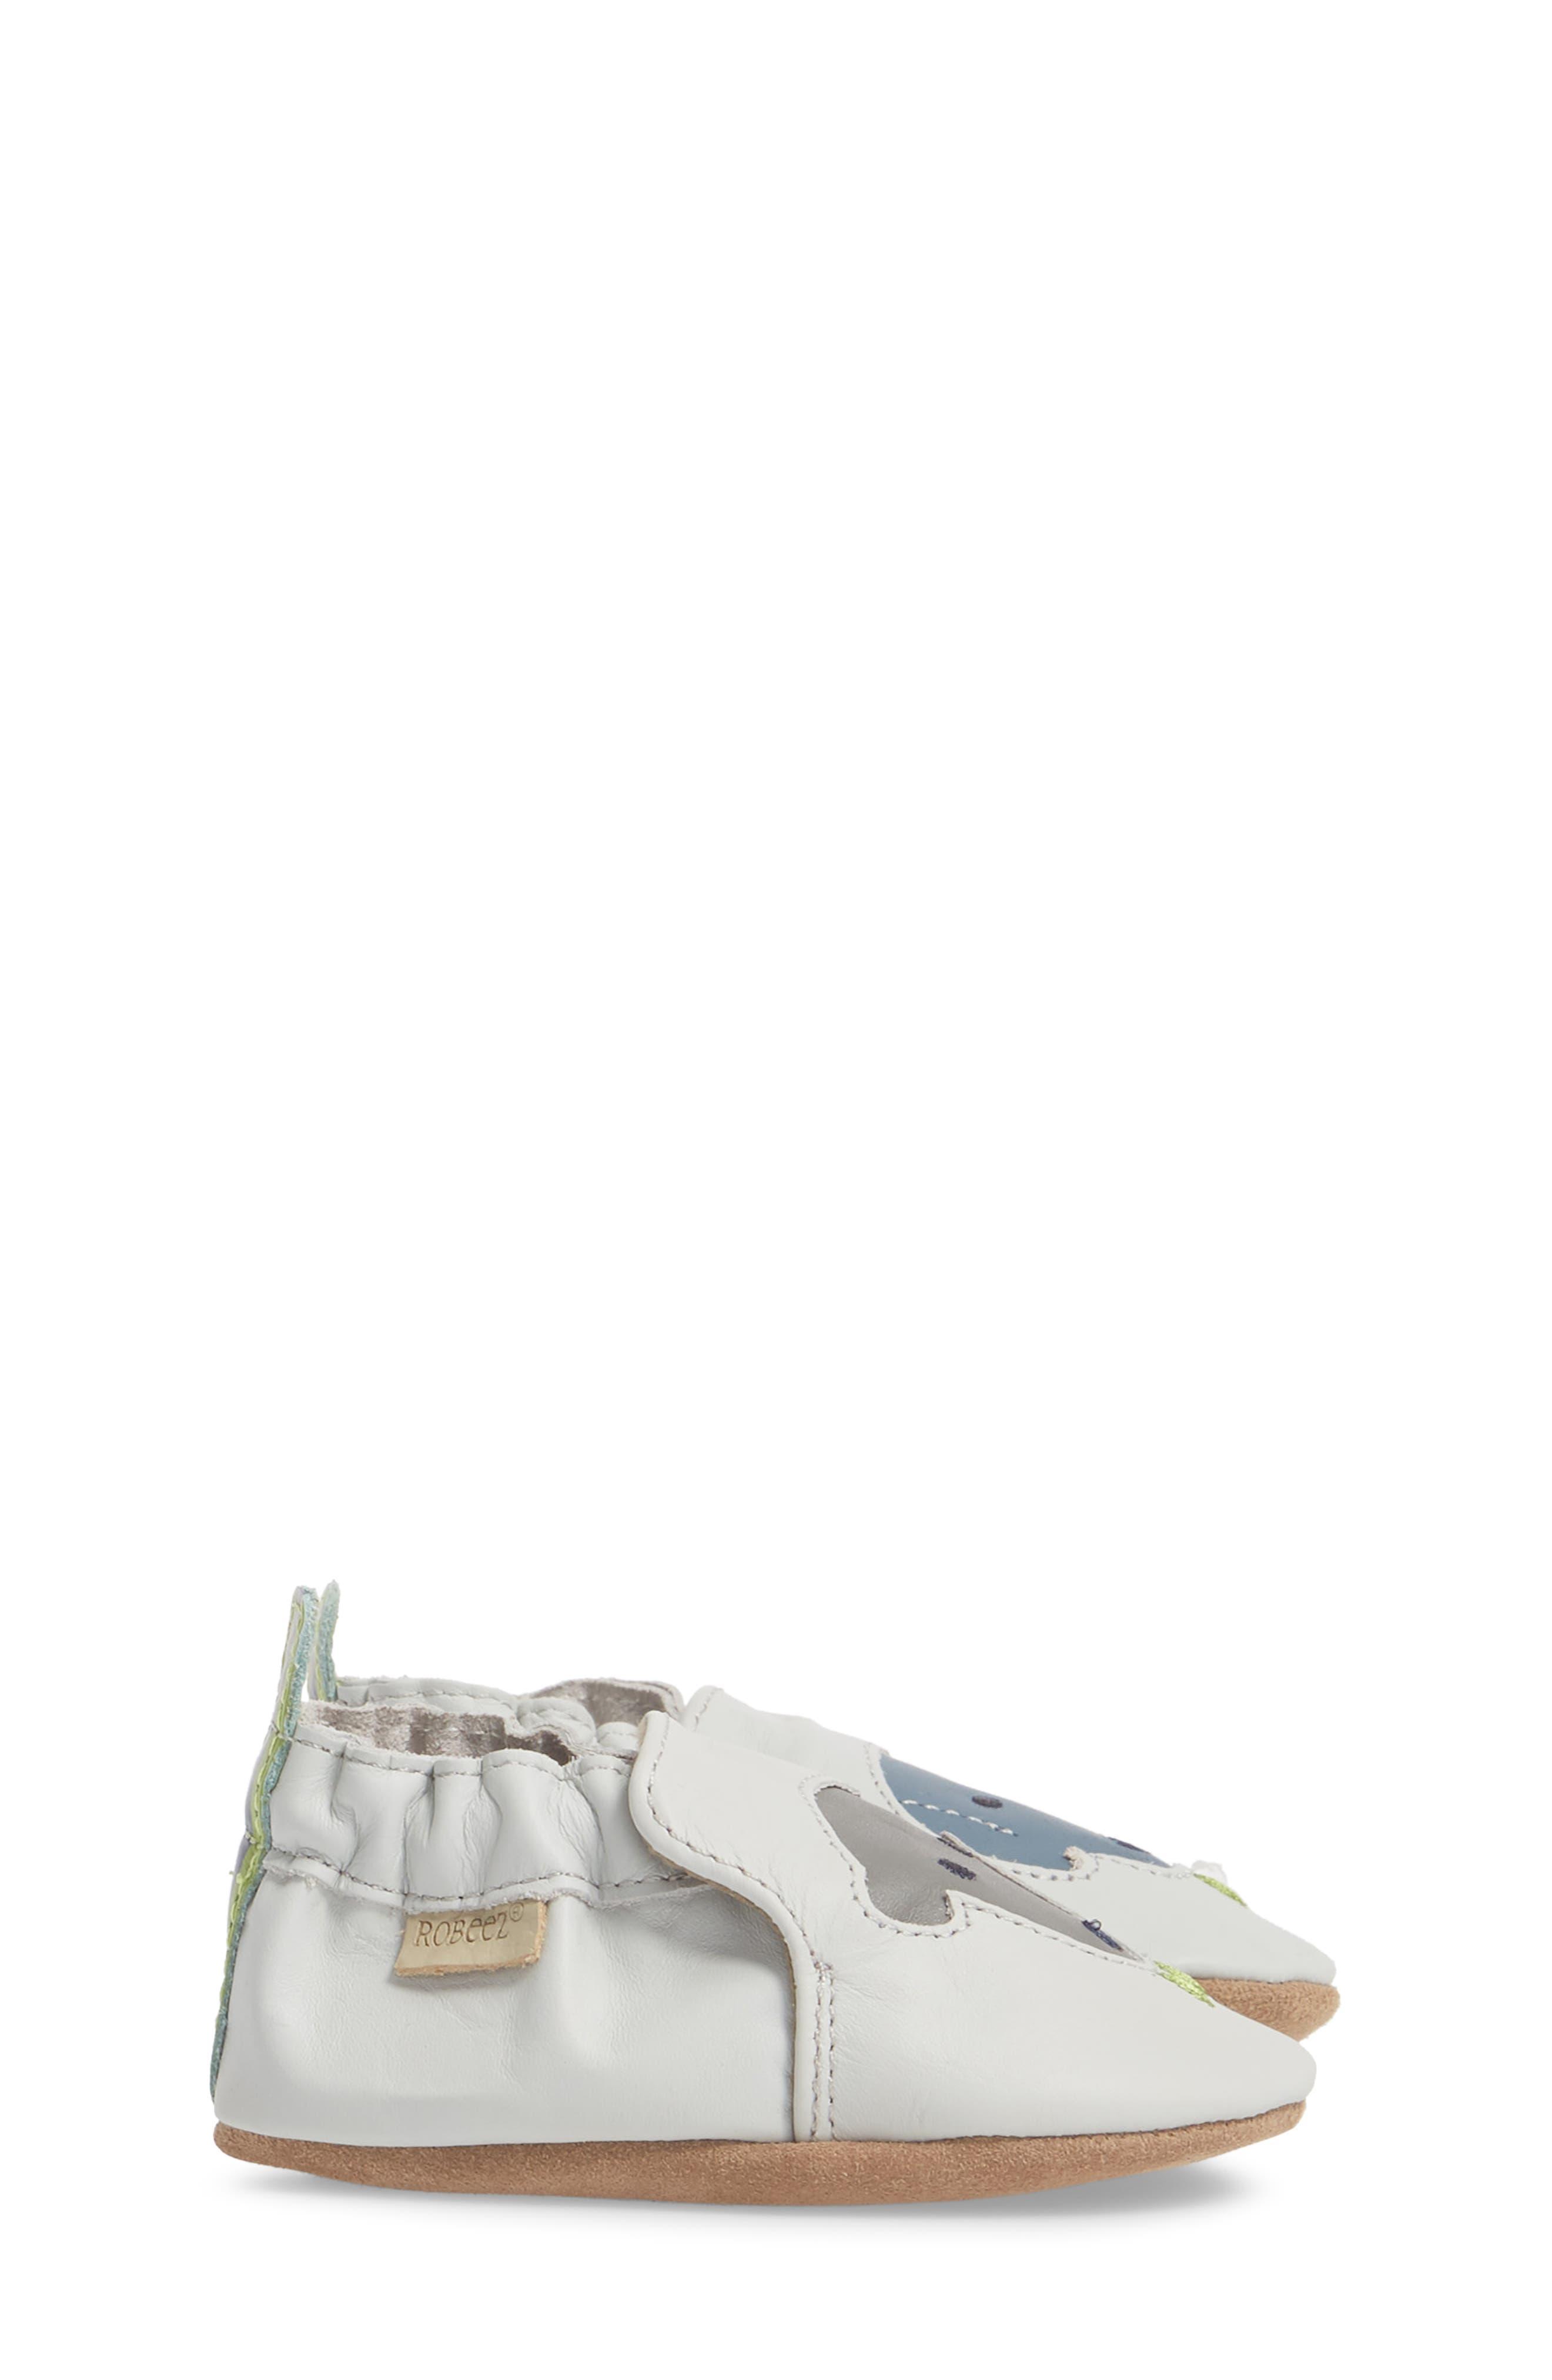 Dog Buddies Moccasin Crib Shoe,                             Alternate thumbnail 4, color,                             Light Grey